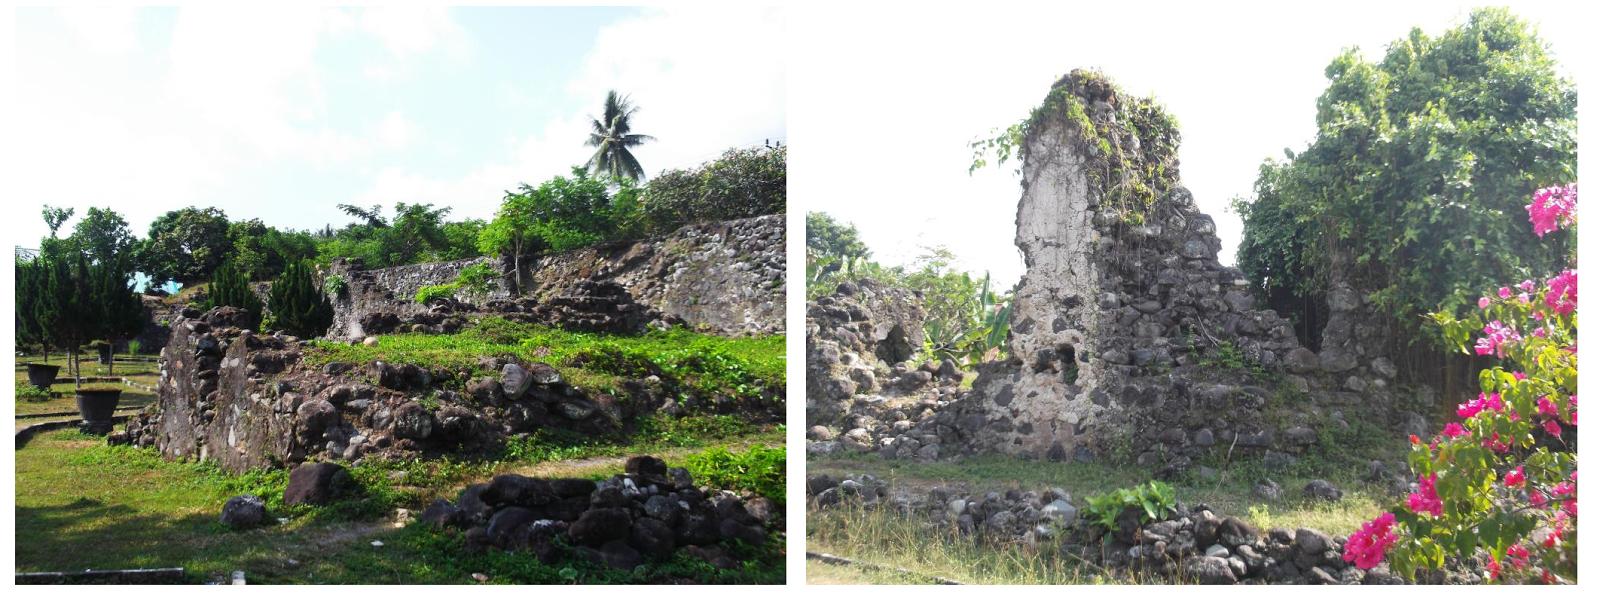 Indonesia Tourism Fort Kastela Ternate History Tour Benteng Kota